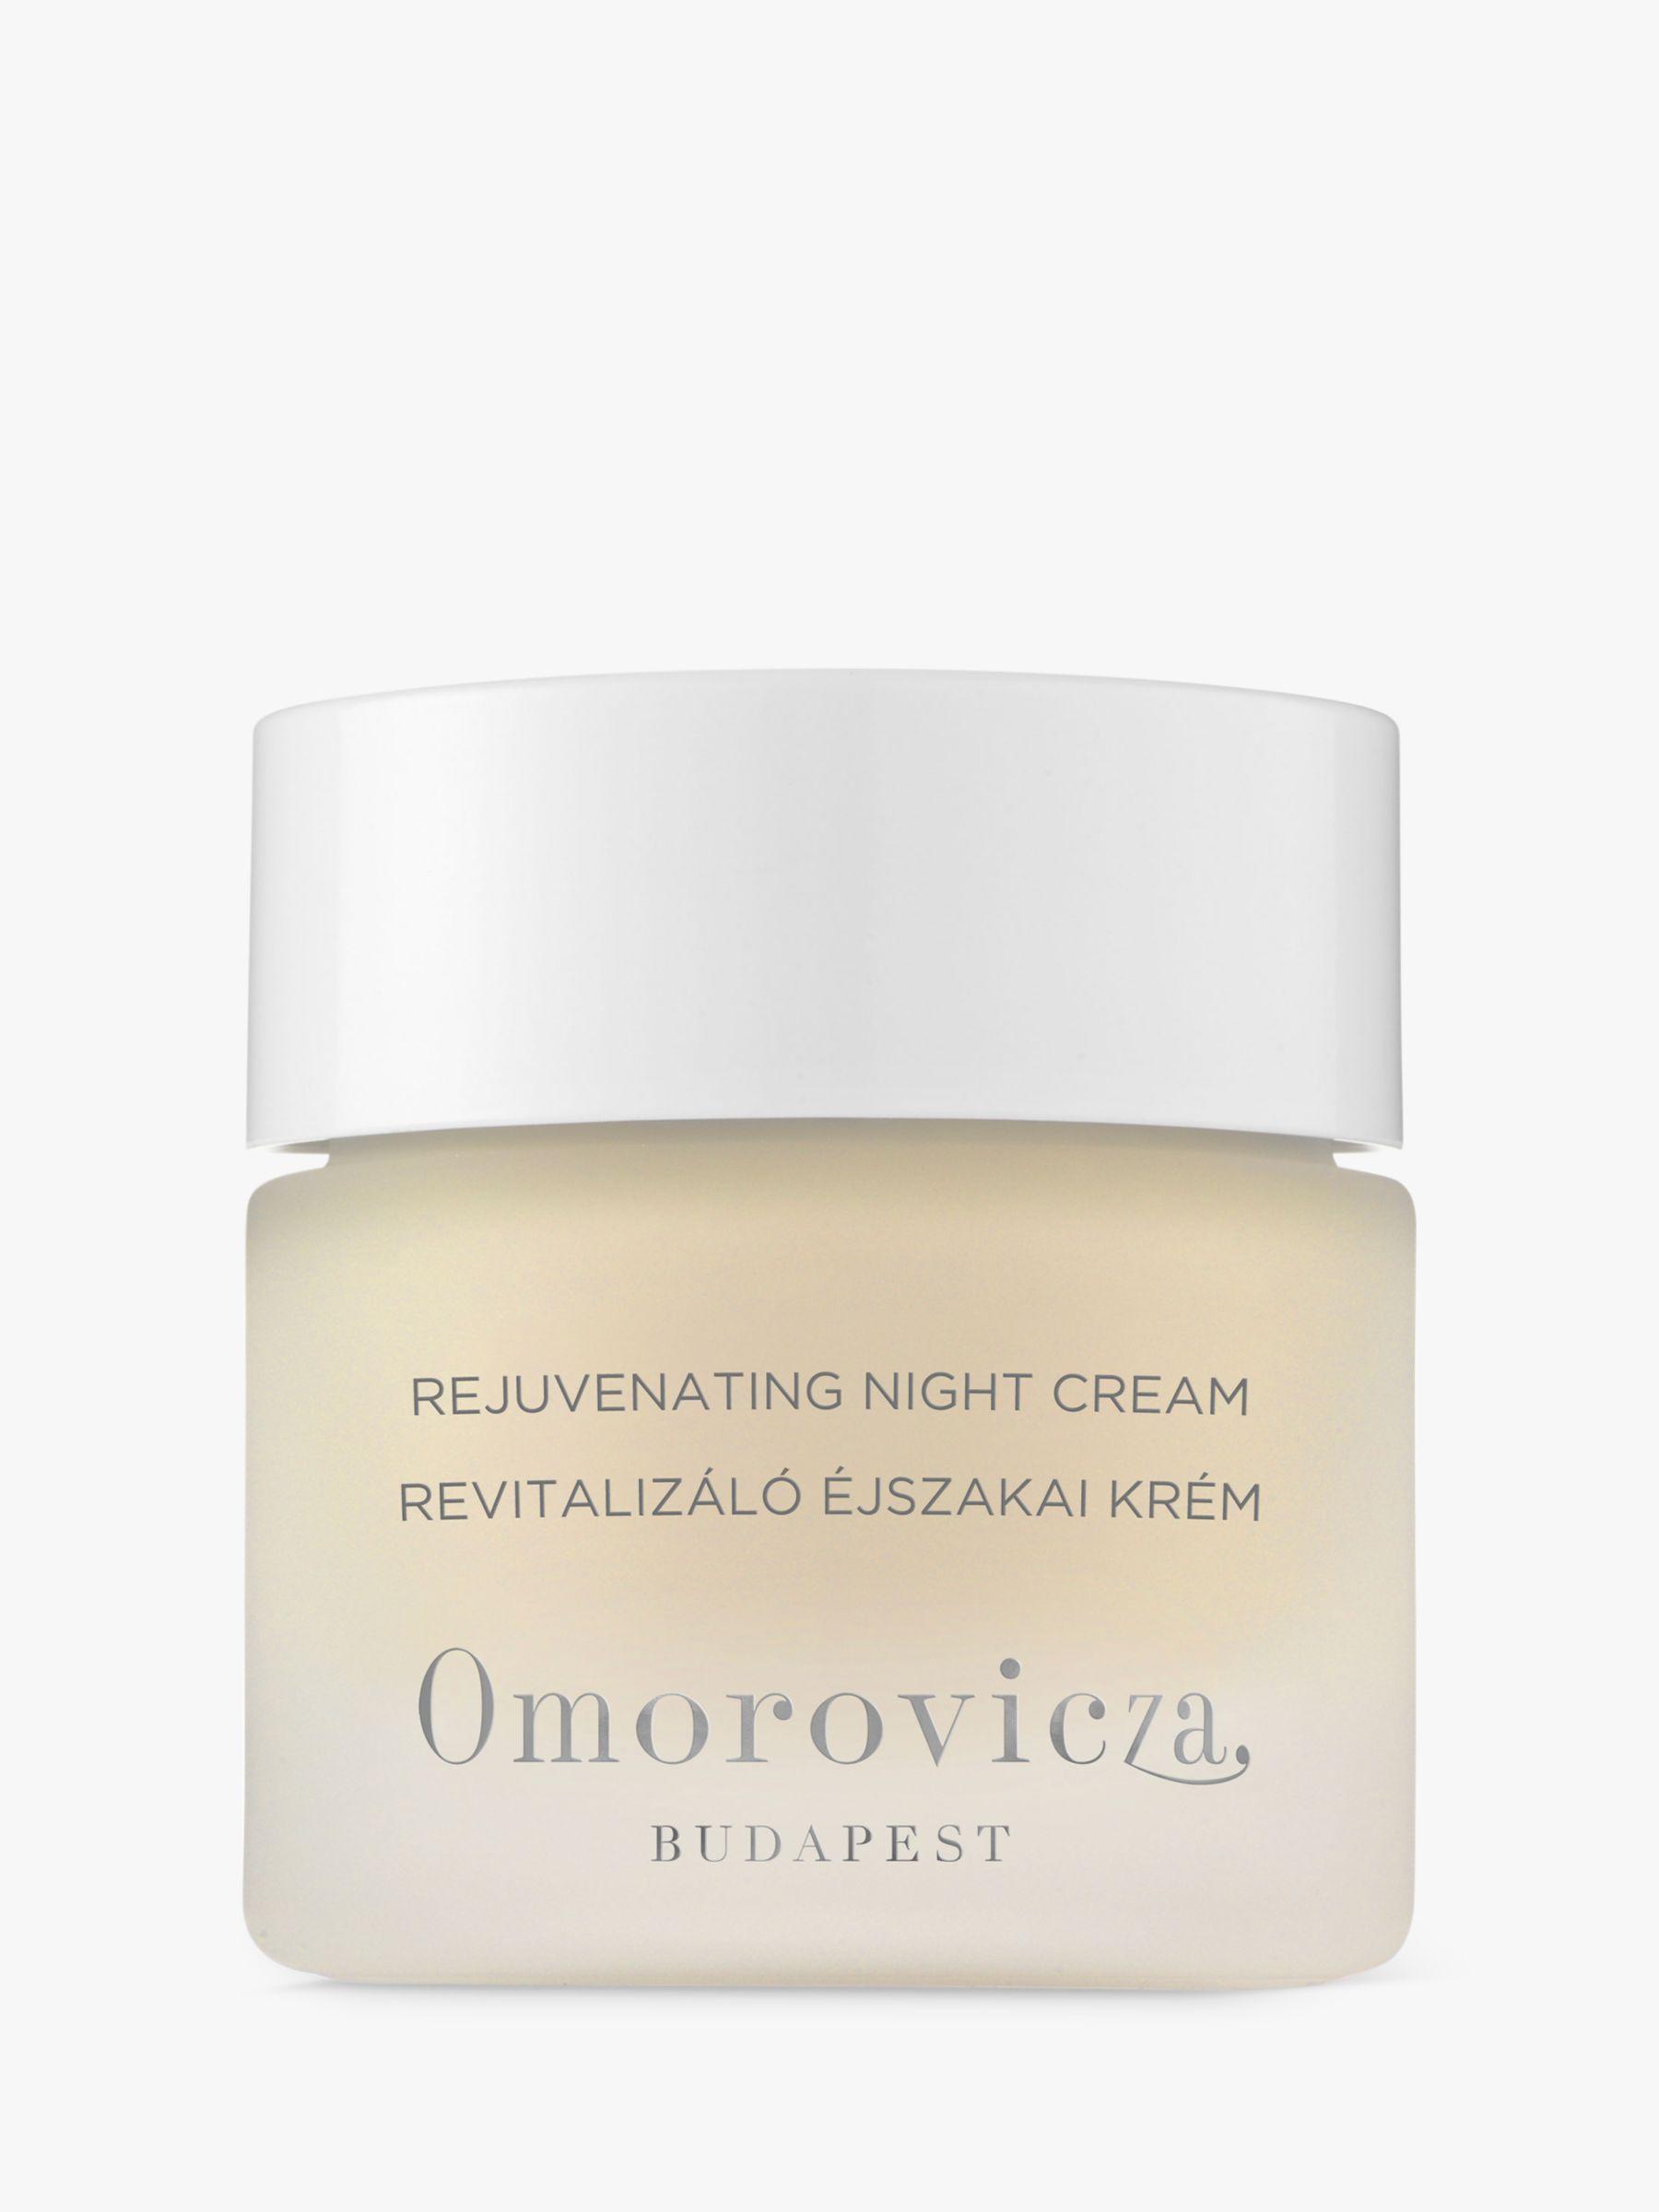 Omorovicza Omorovicza Rejuvenating Night Cream, 50ml